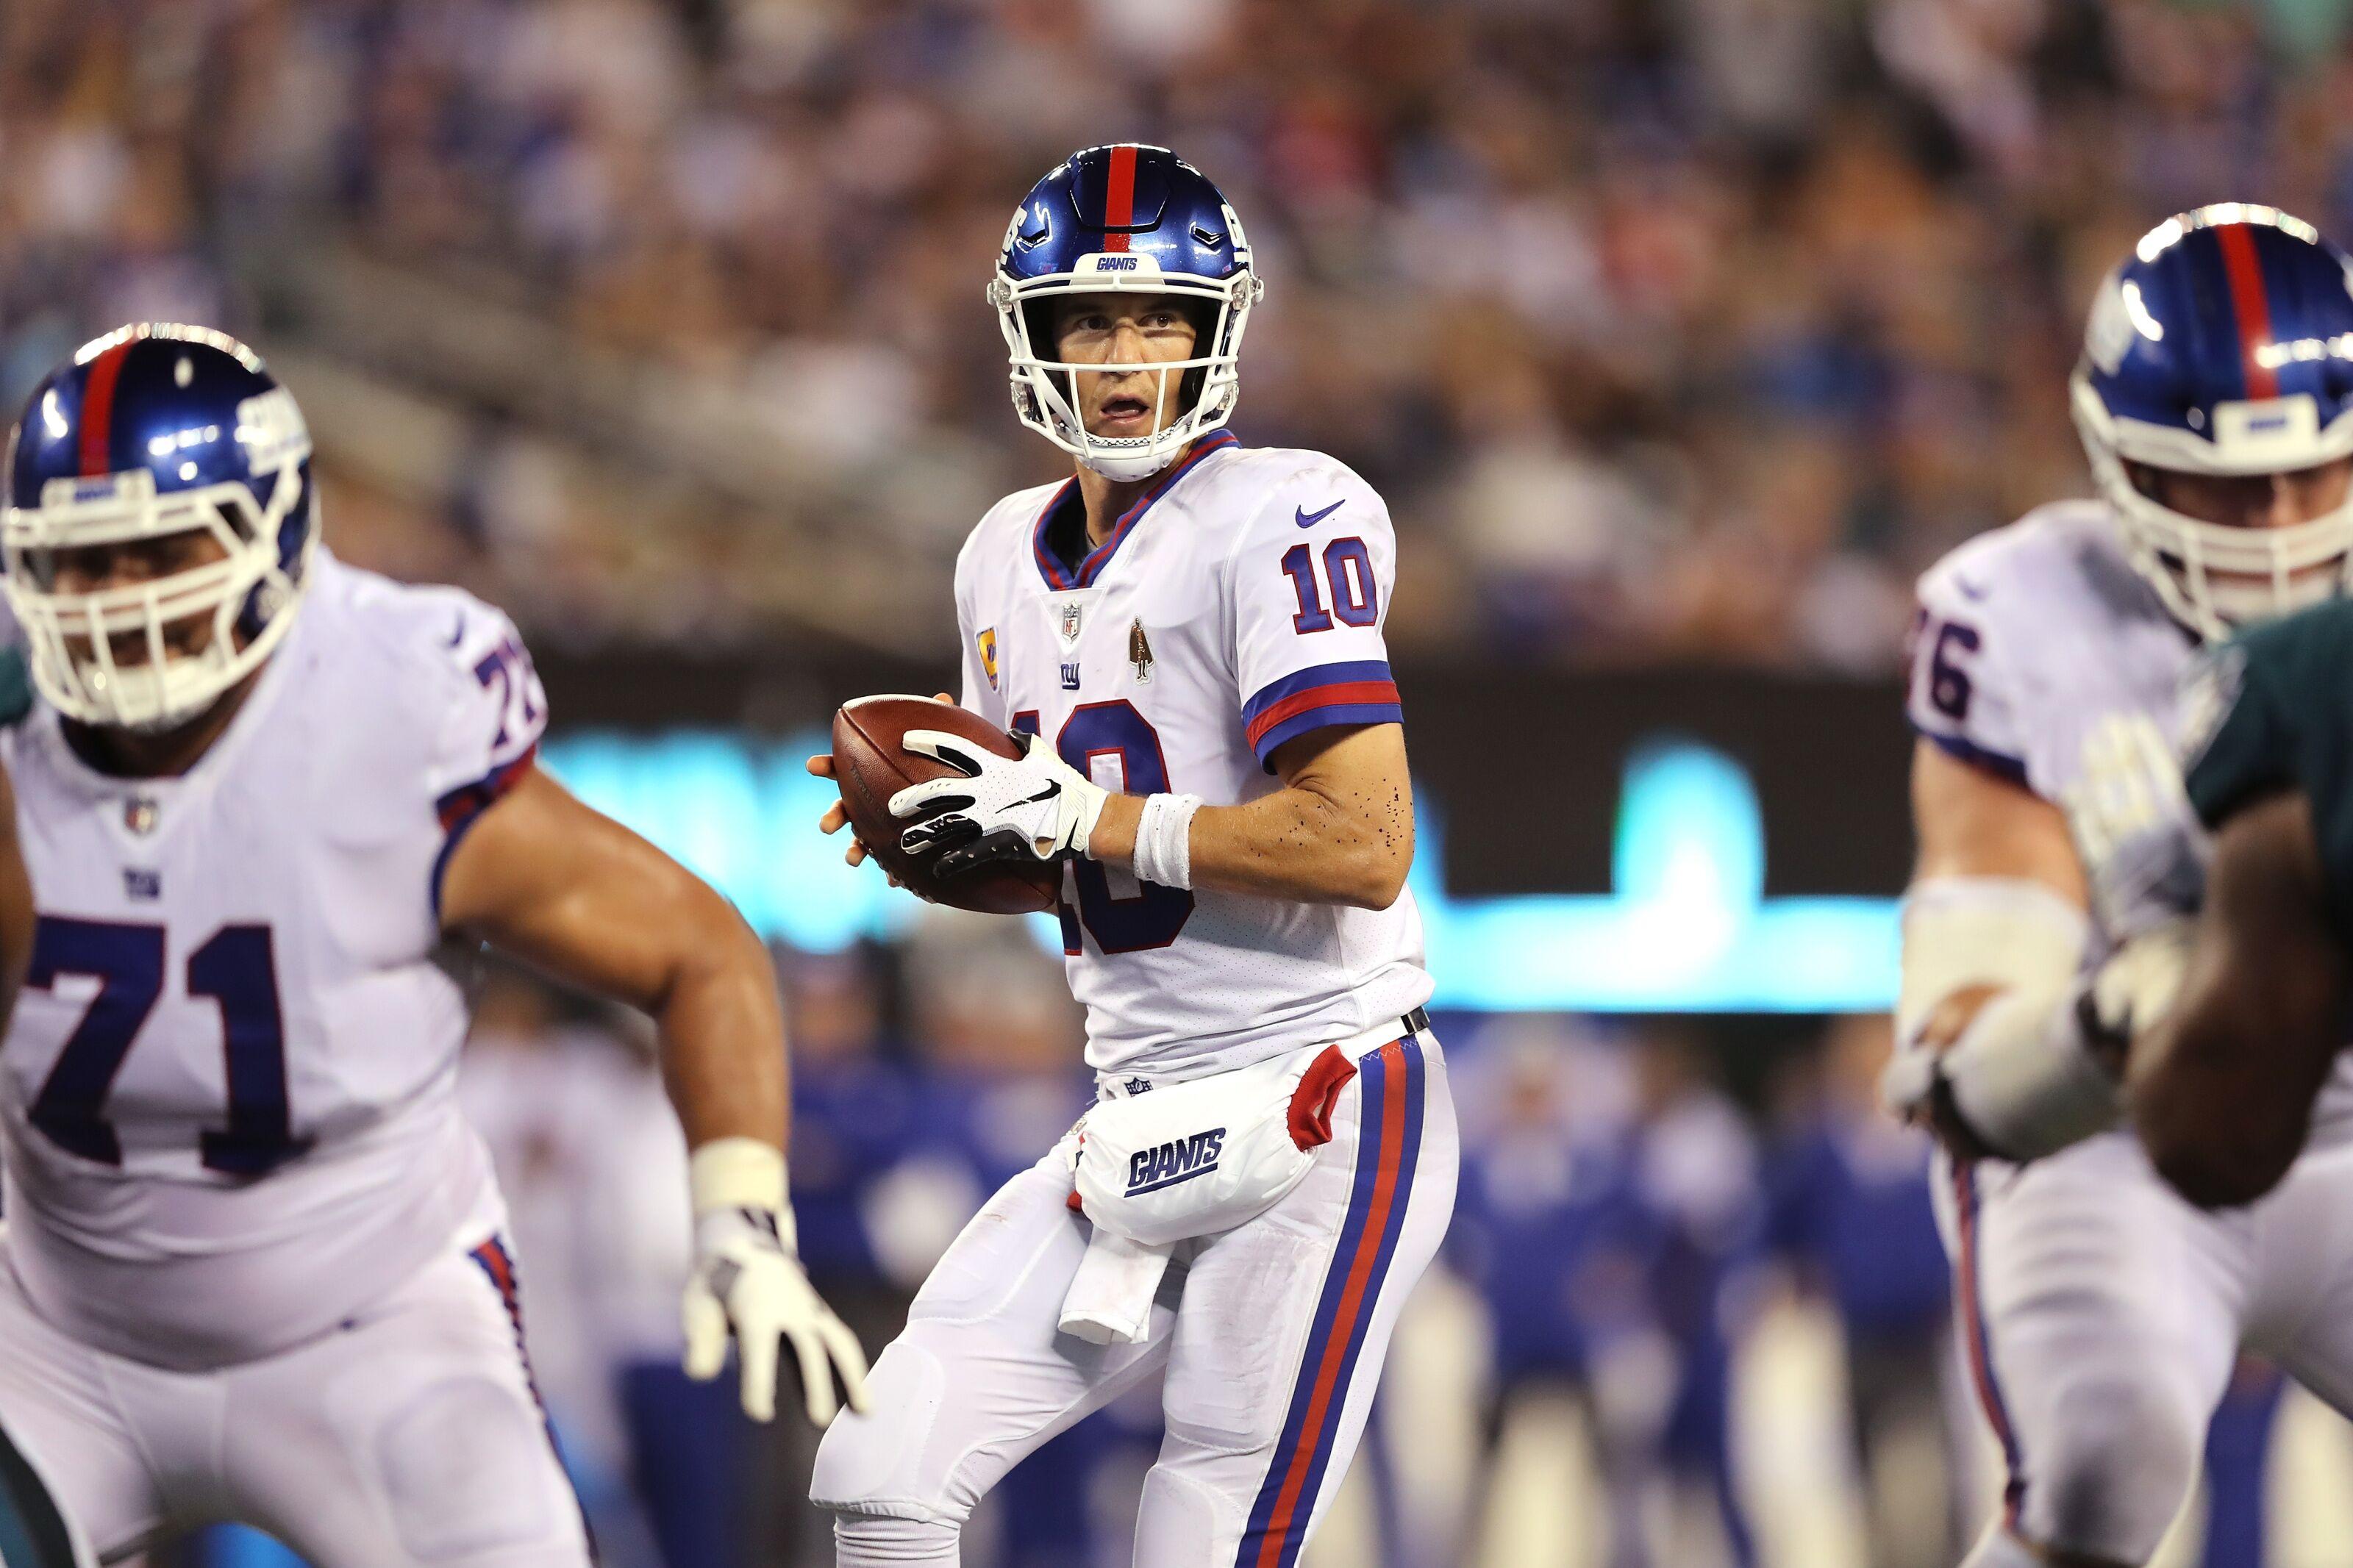 New York Giants: Trade Eli Manning to the Jacksonville Jaguars?